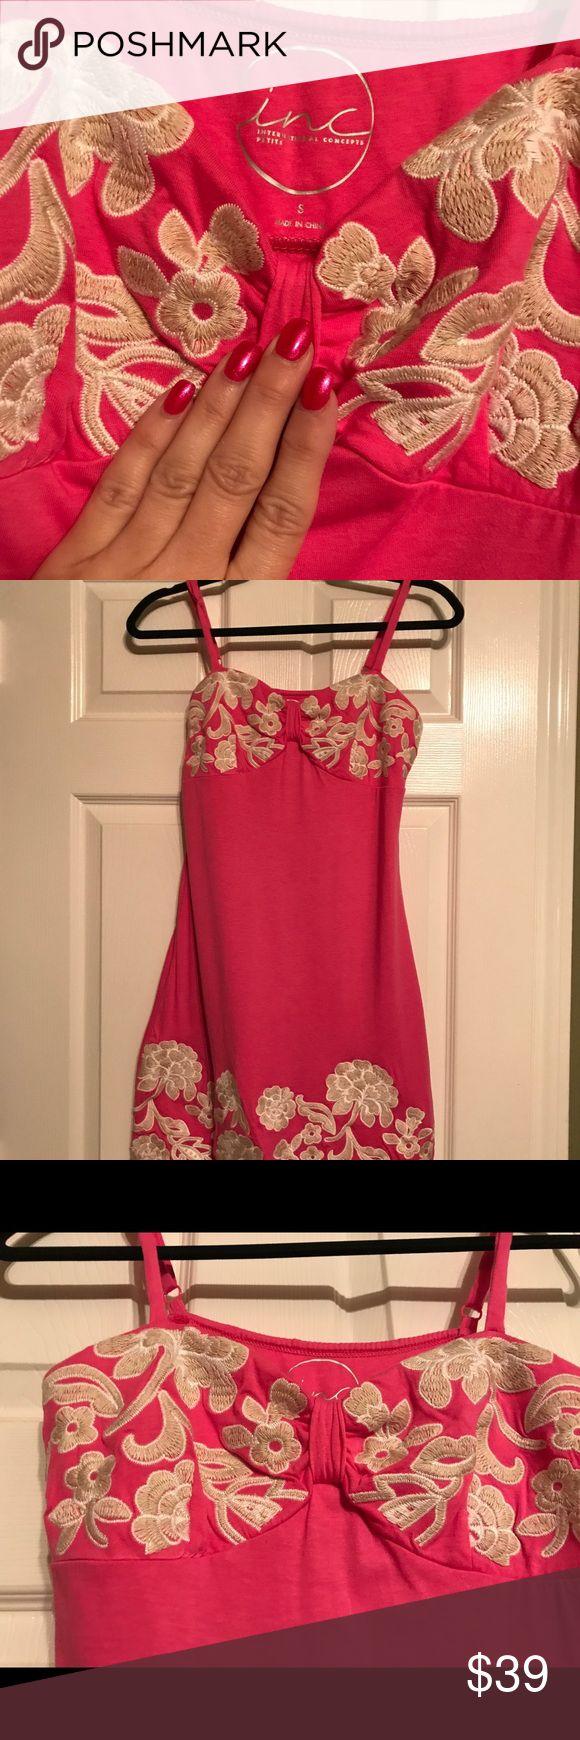 INC hot pink sundress size small INC hot pink spaghetti strapped sun dress size small INC International Concepts Dresses Mini